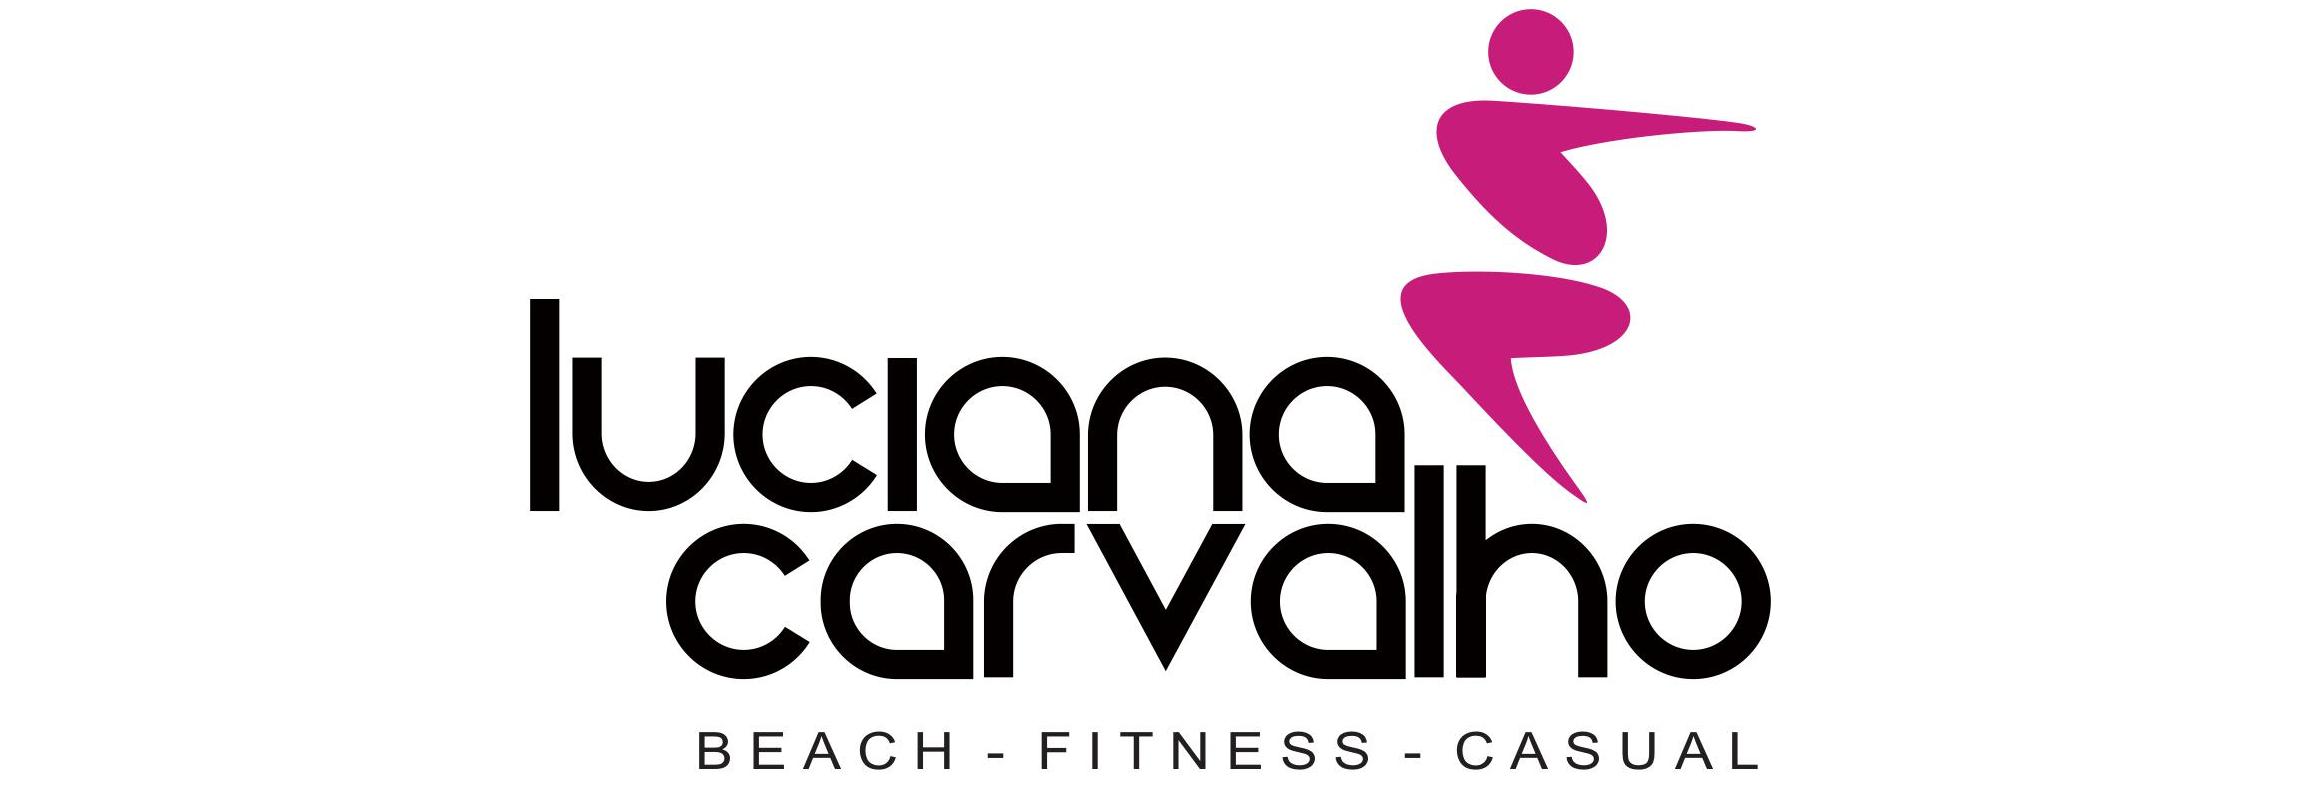 Luciana Carvalho Fitness e Beachwear